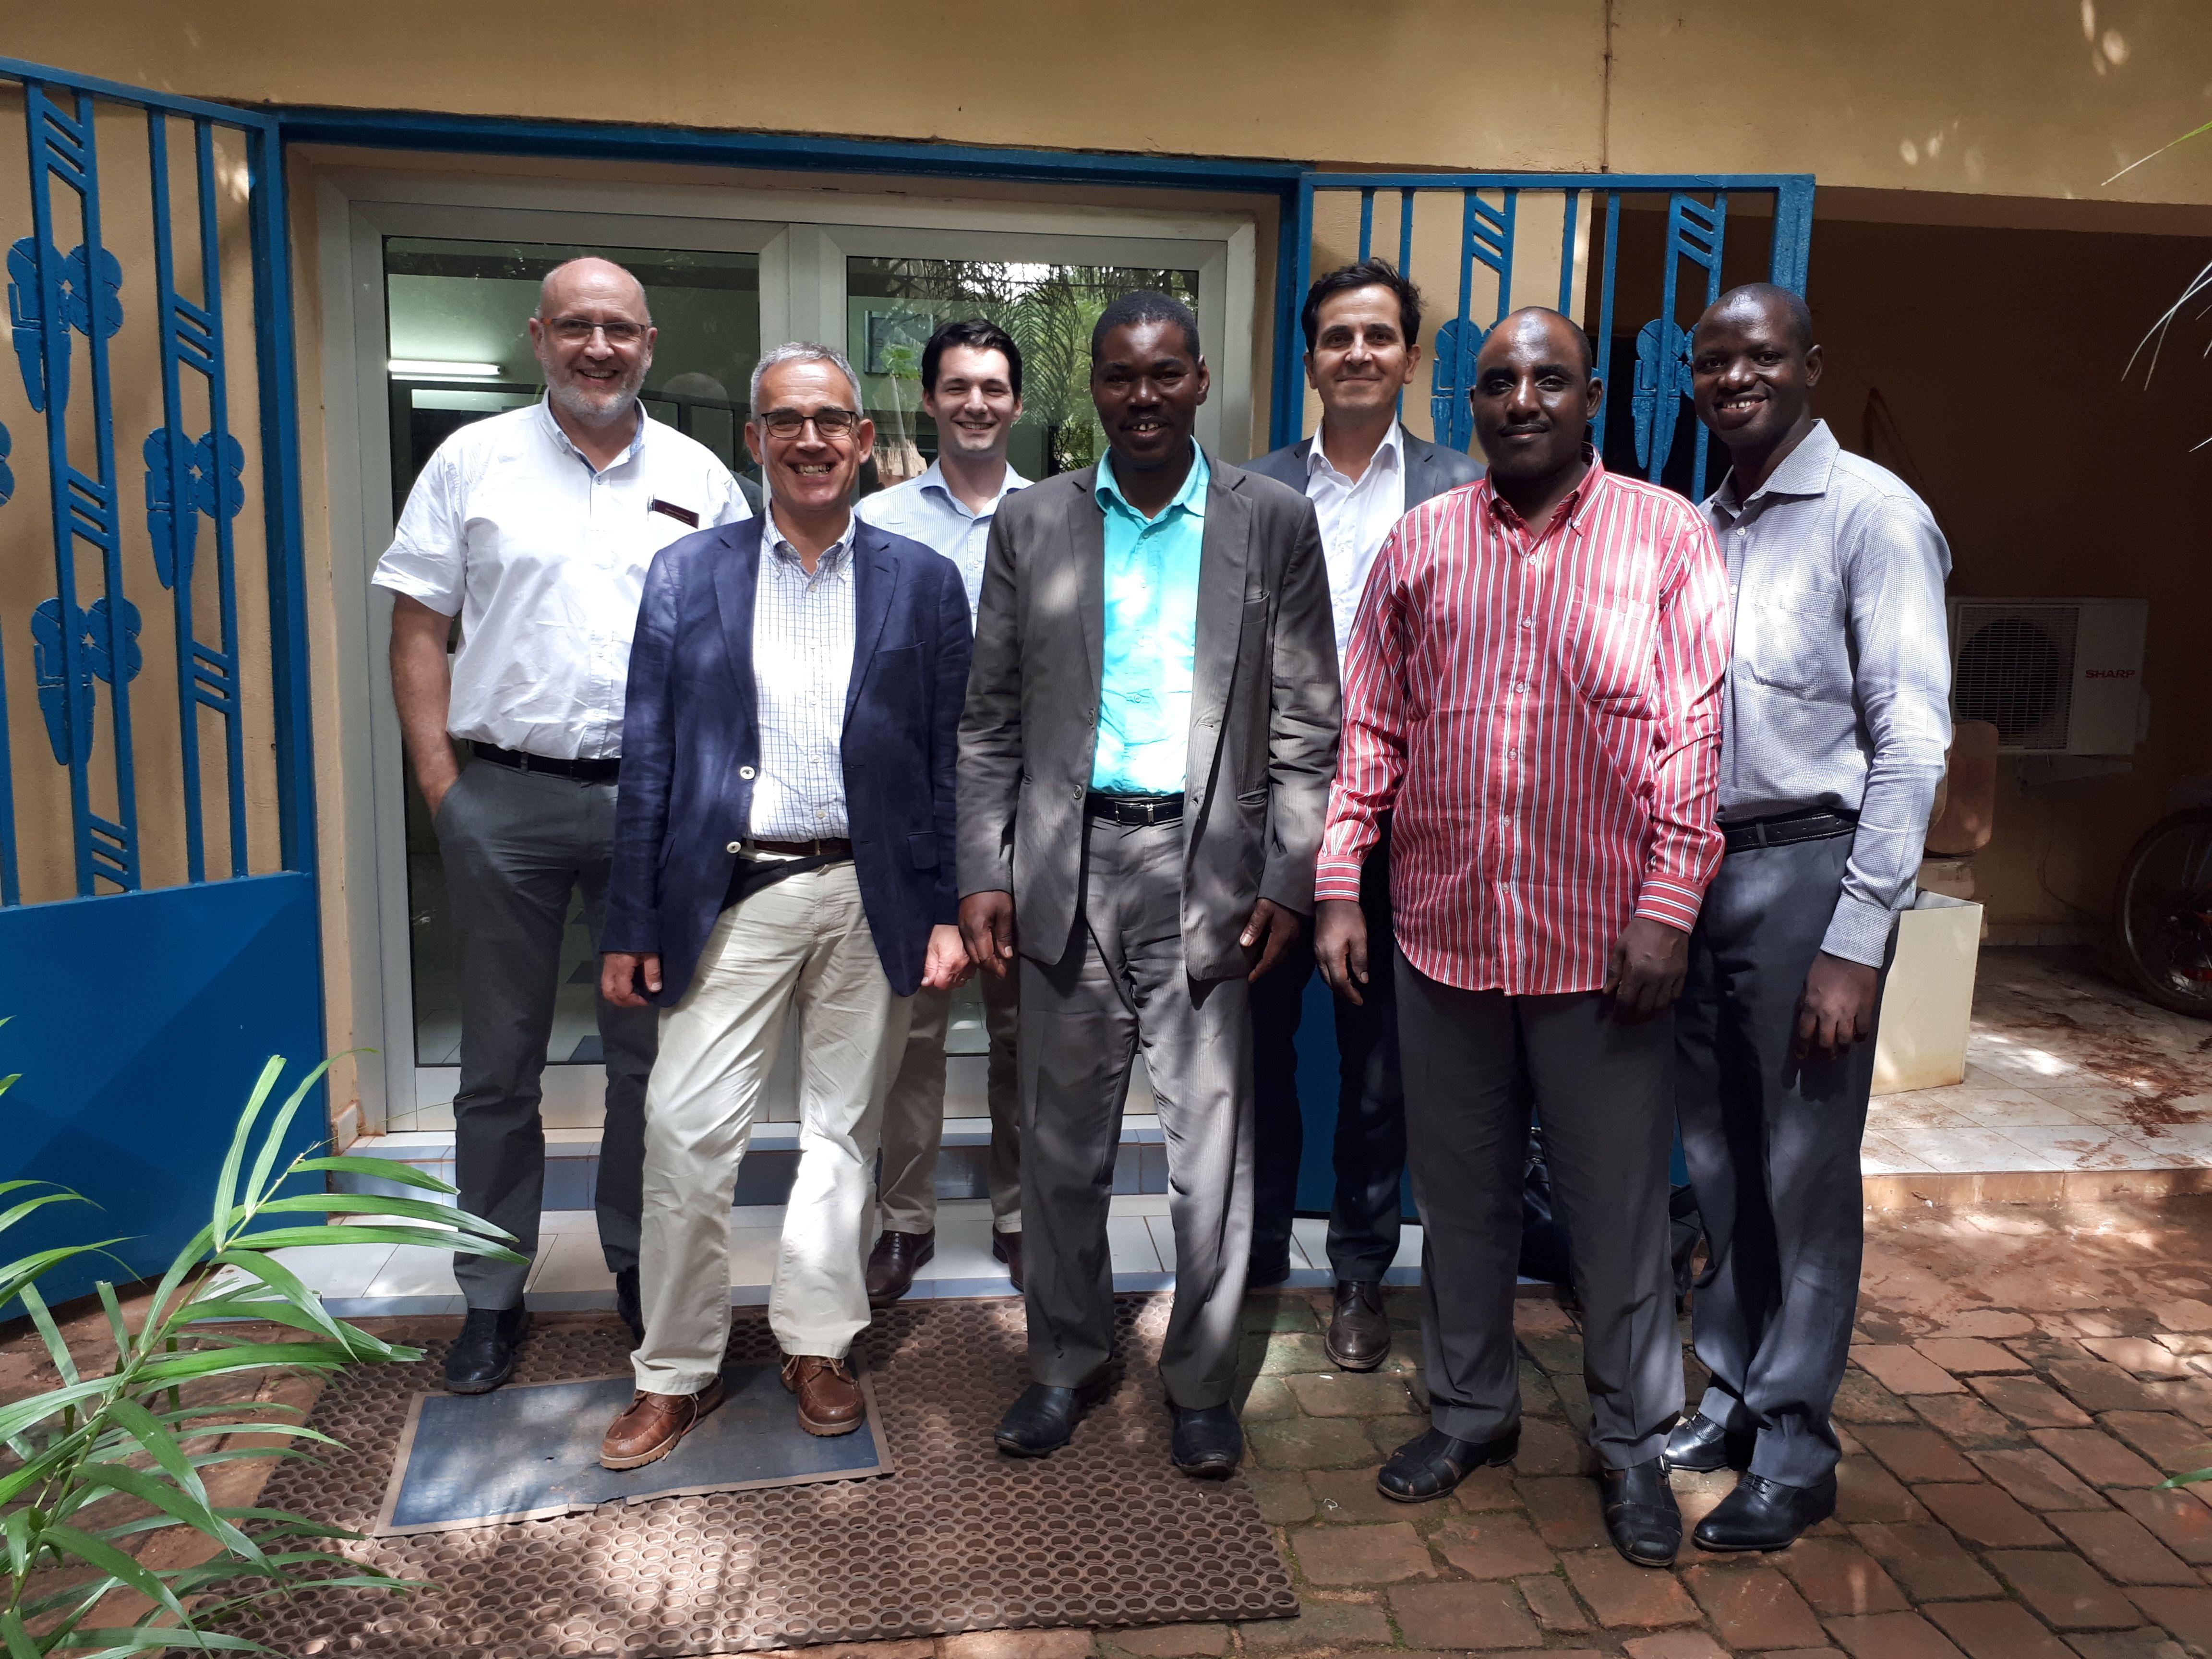 De gauche à droite: Thierry BARBOTTE (UDUMA), Arco VAN DER TOORN (AQUA FOR ALL), Nicolaas VAN DER WILK (UDUMA), Bourama TRAORE (BERE CONSULTING), Lionel CORMIER (DEMETER PARTNERS), Abdoul ABDOU (SNV-MALI) et Emmanuel DIARRA (AKVO-MALI).